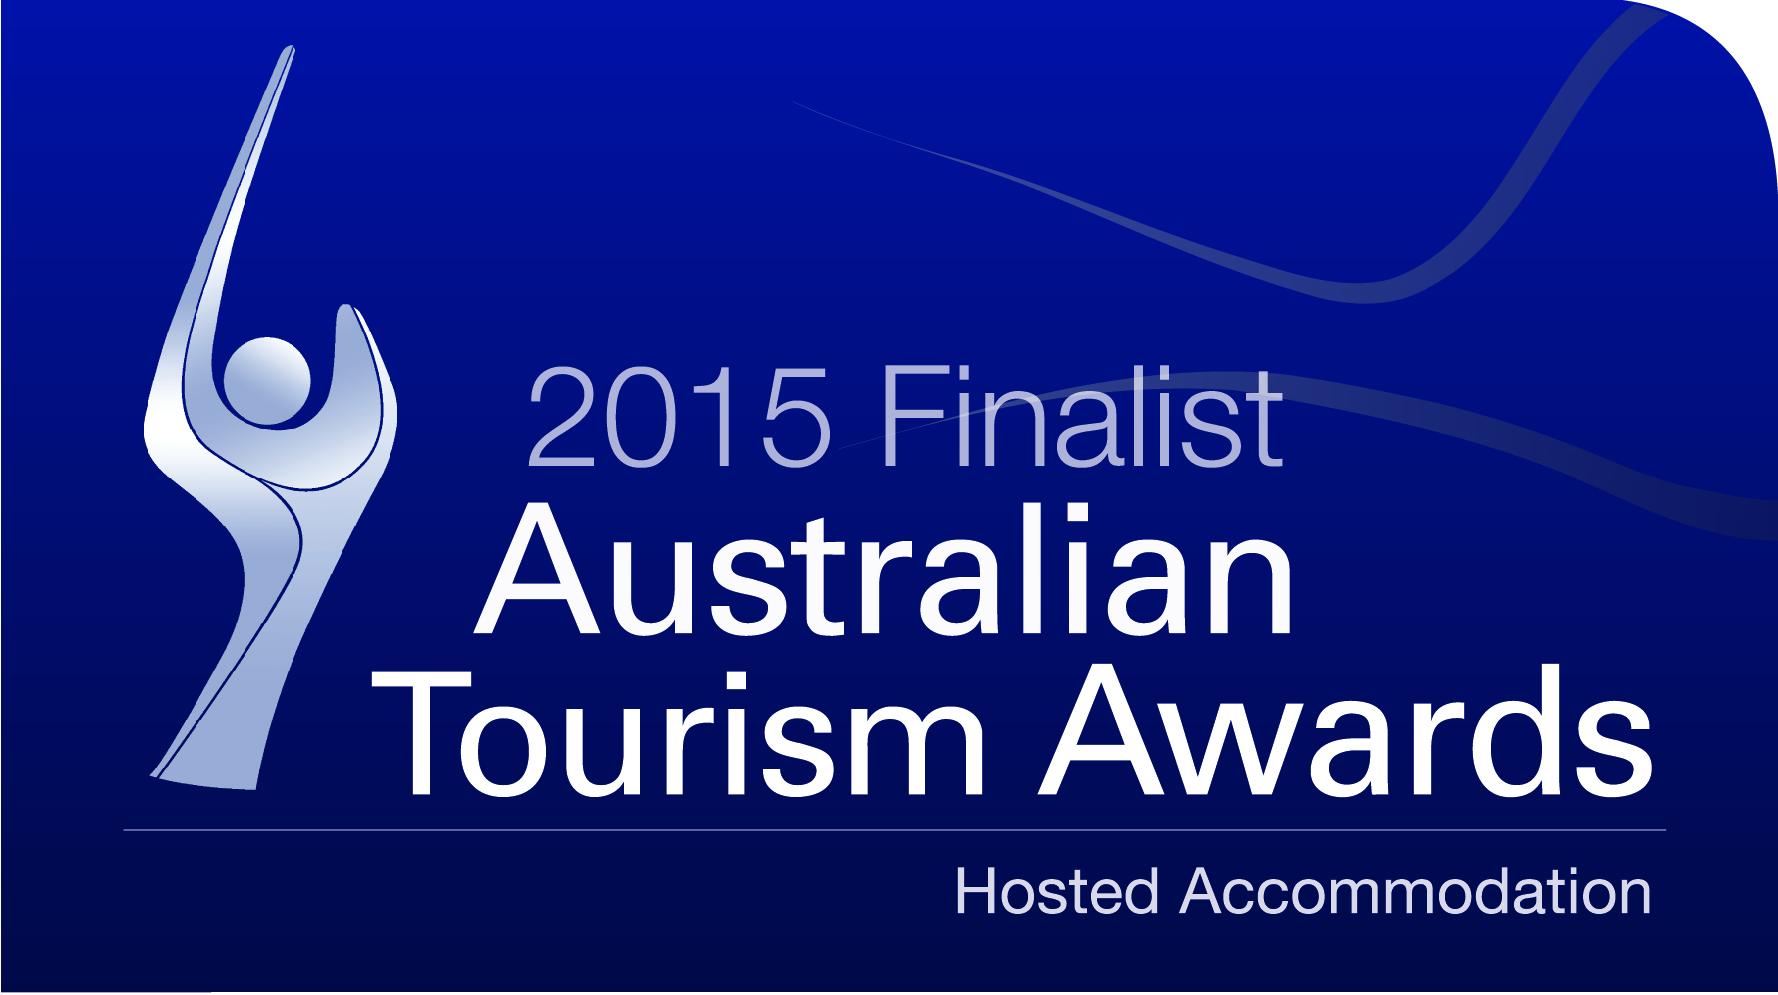 Qantas Australian Tourism Awards HideAway Haven